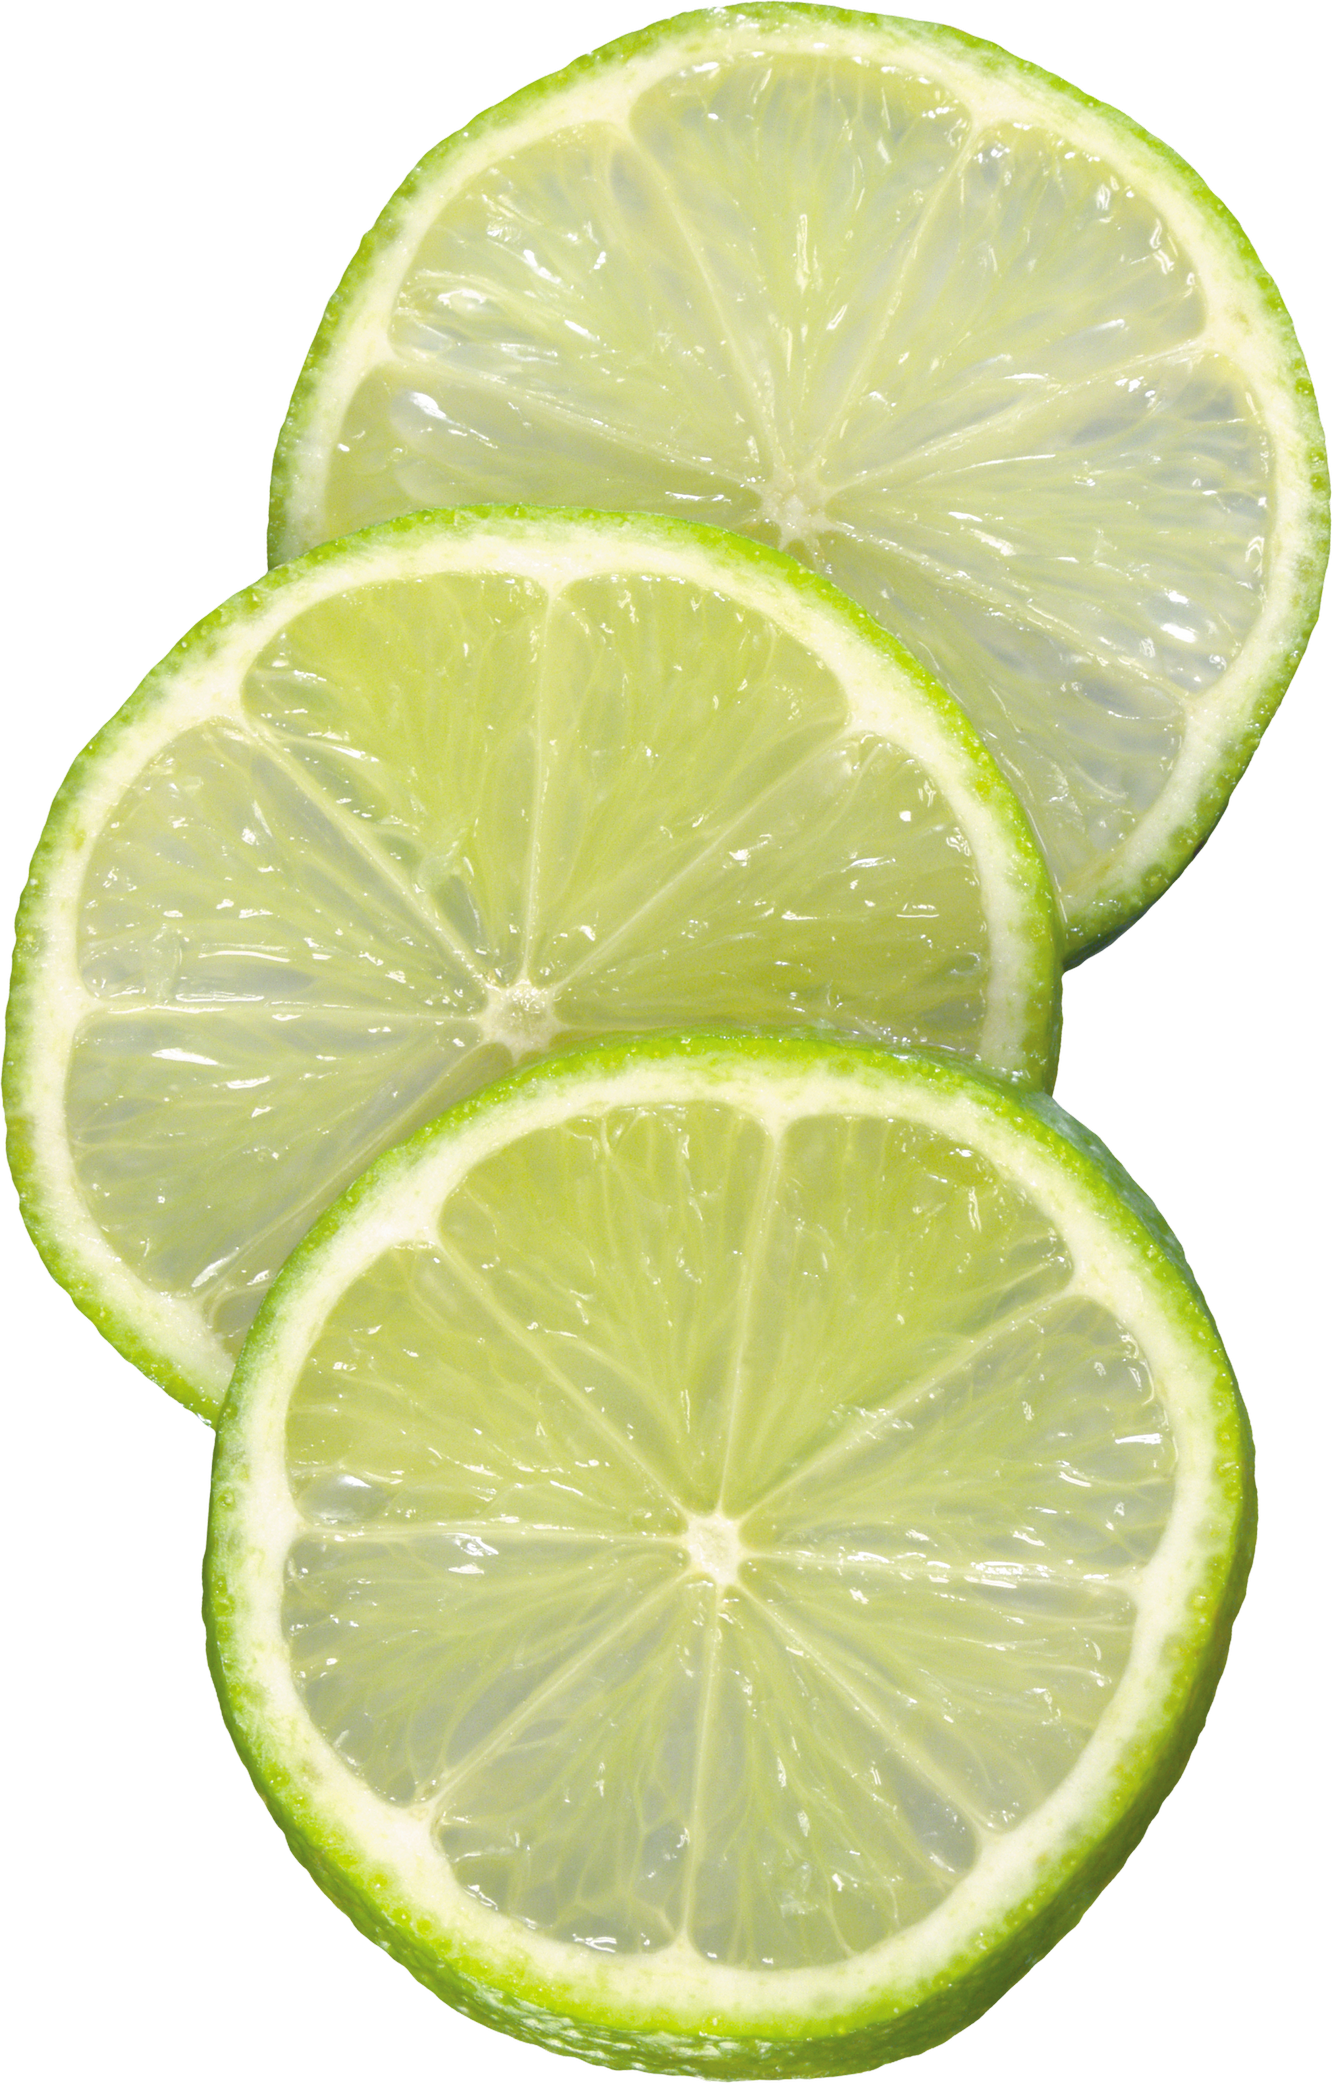 Lime PNG Image - PurePNG | Free transparent CC0 PNG Image ...